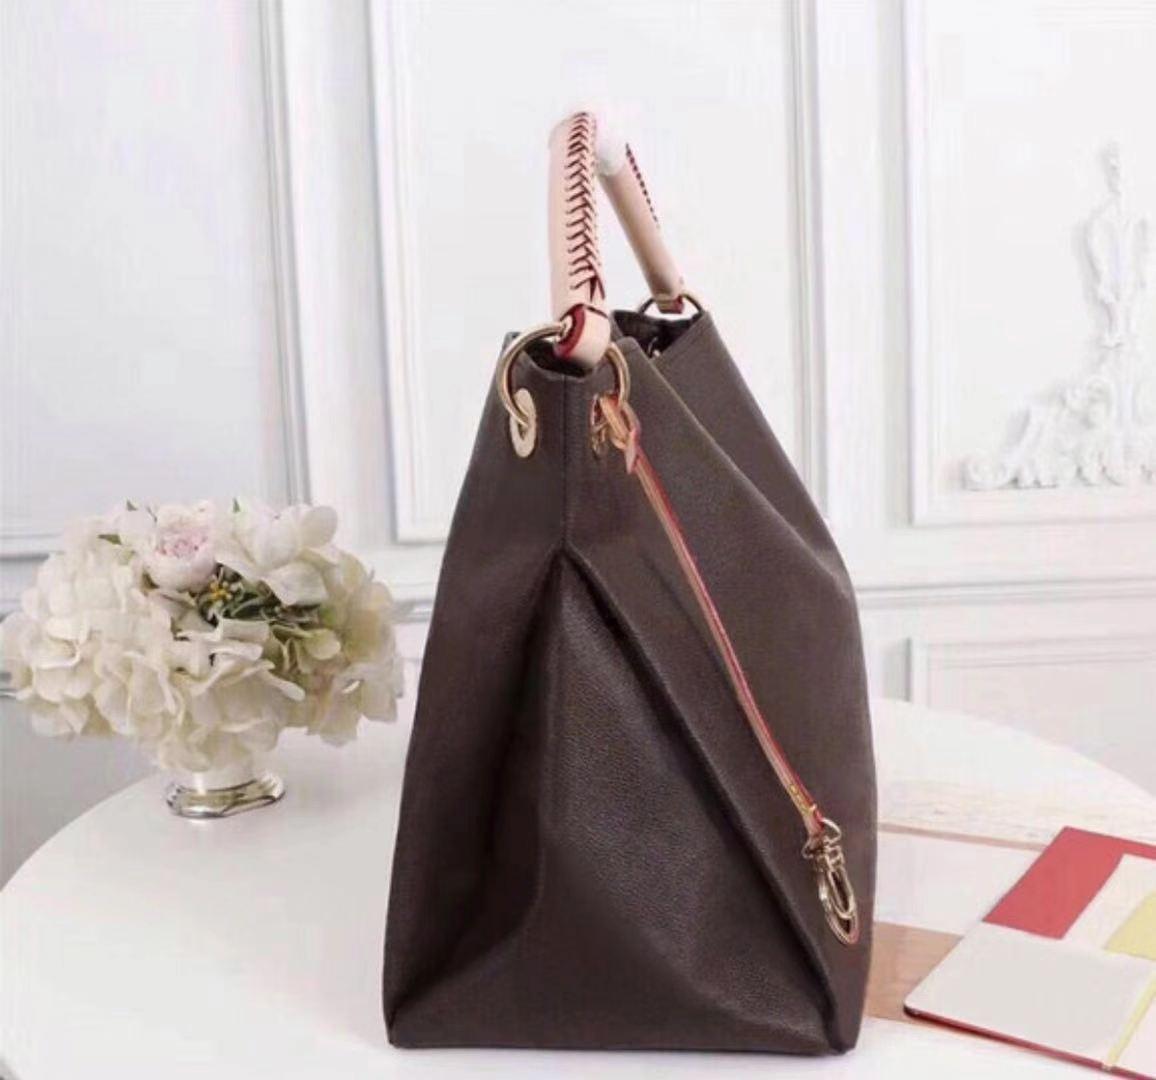 M40249 Classic women designer shoulder bag for women shopping bag large capacity leather Messenger Bag handbags tote Artsy